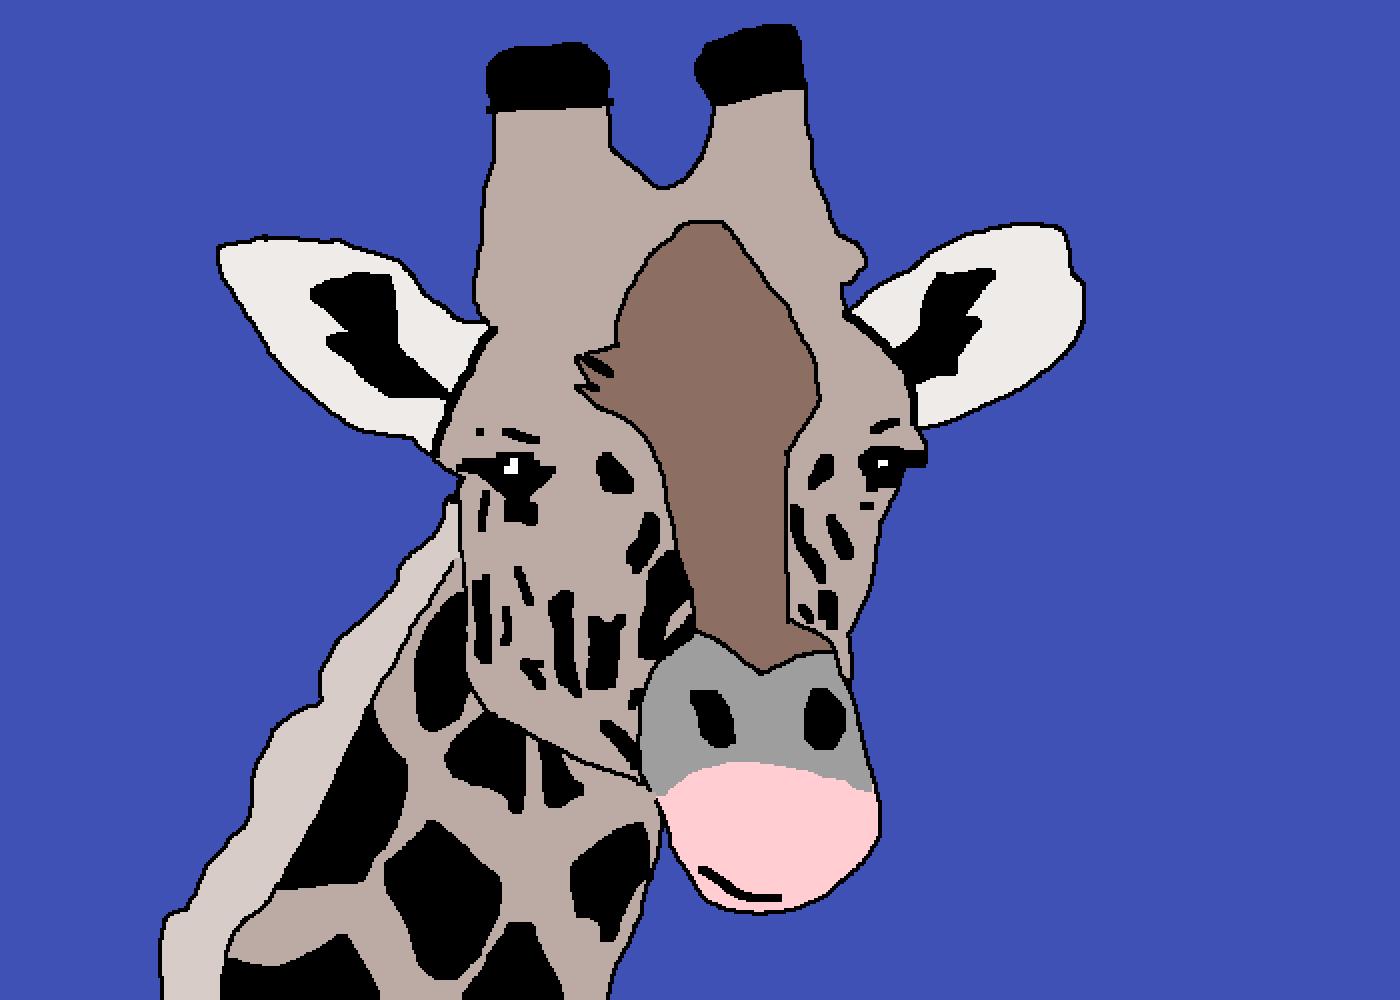 main-image-giraffe  by its-zygarde-omg